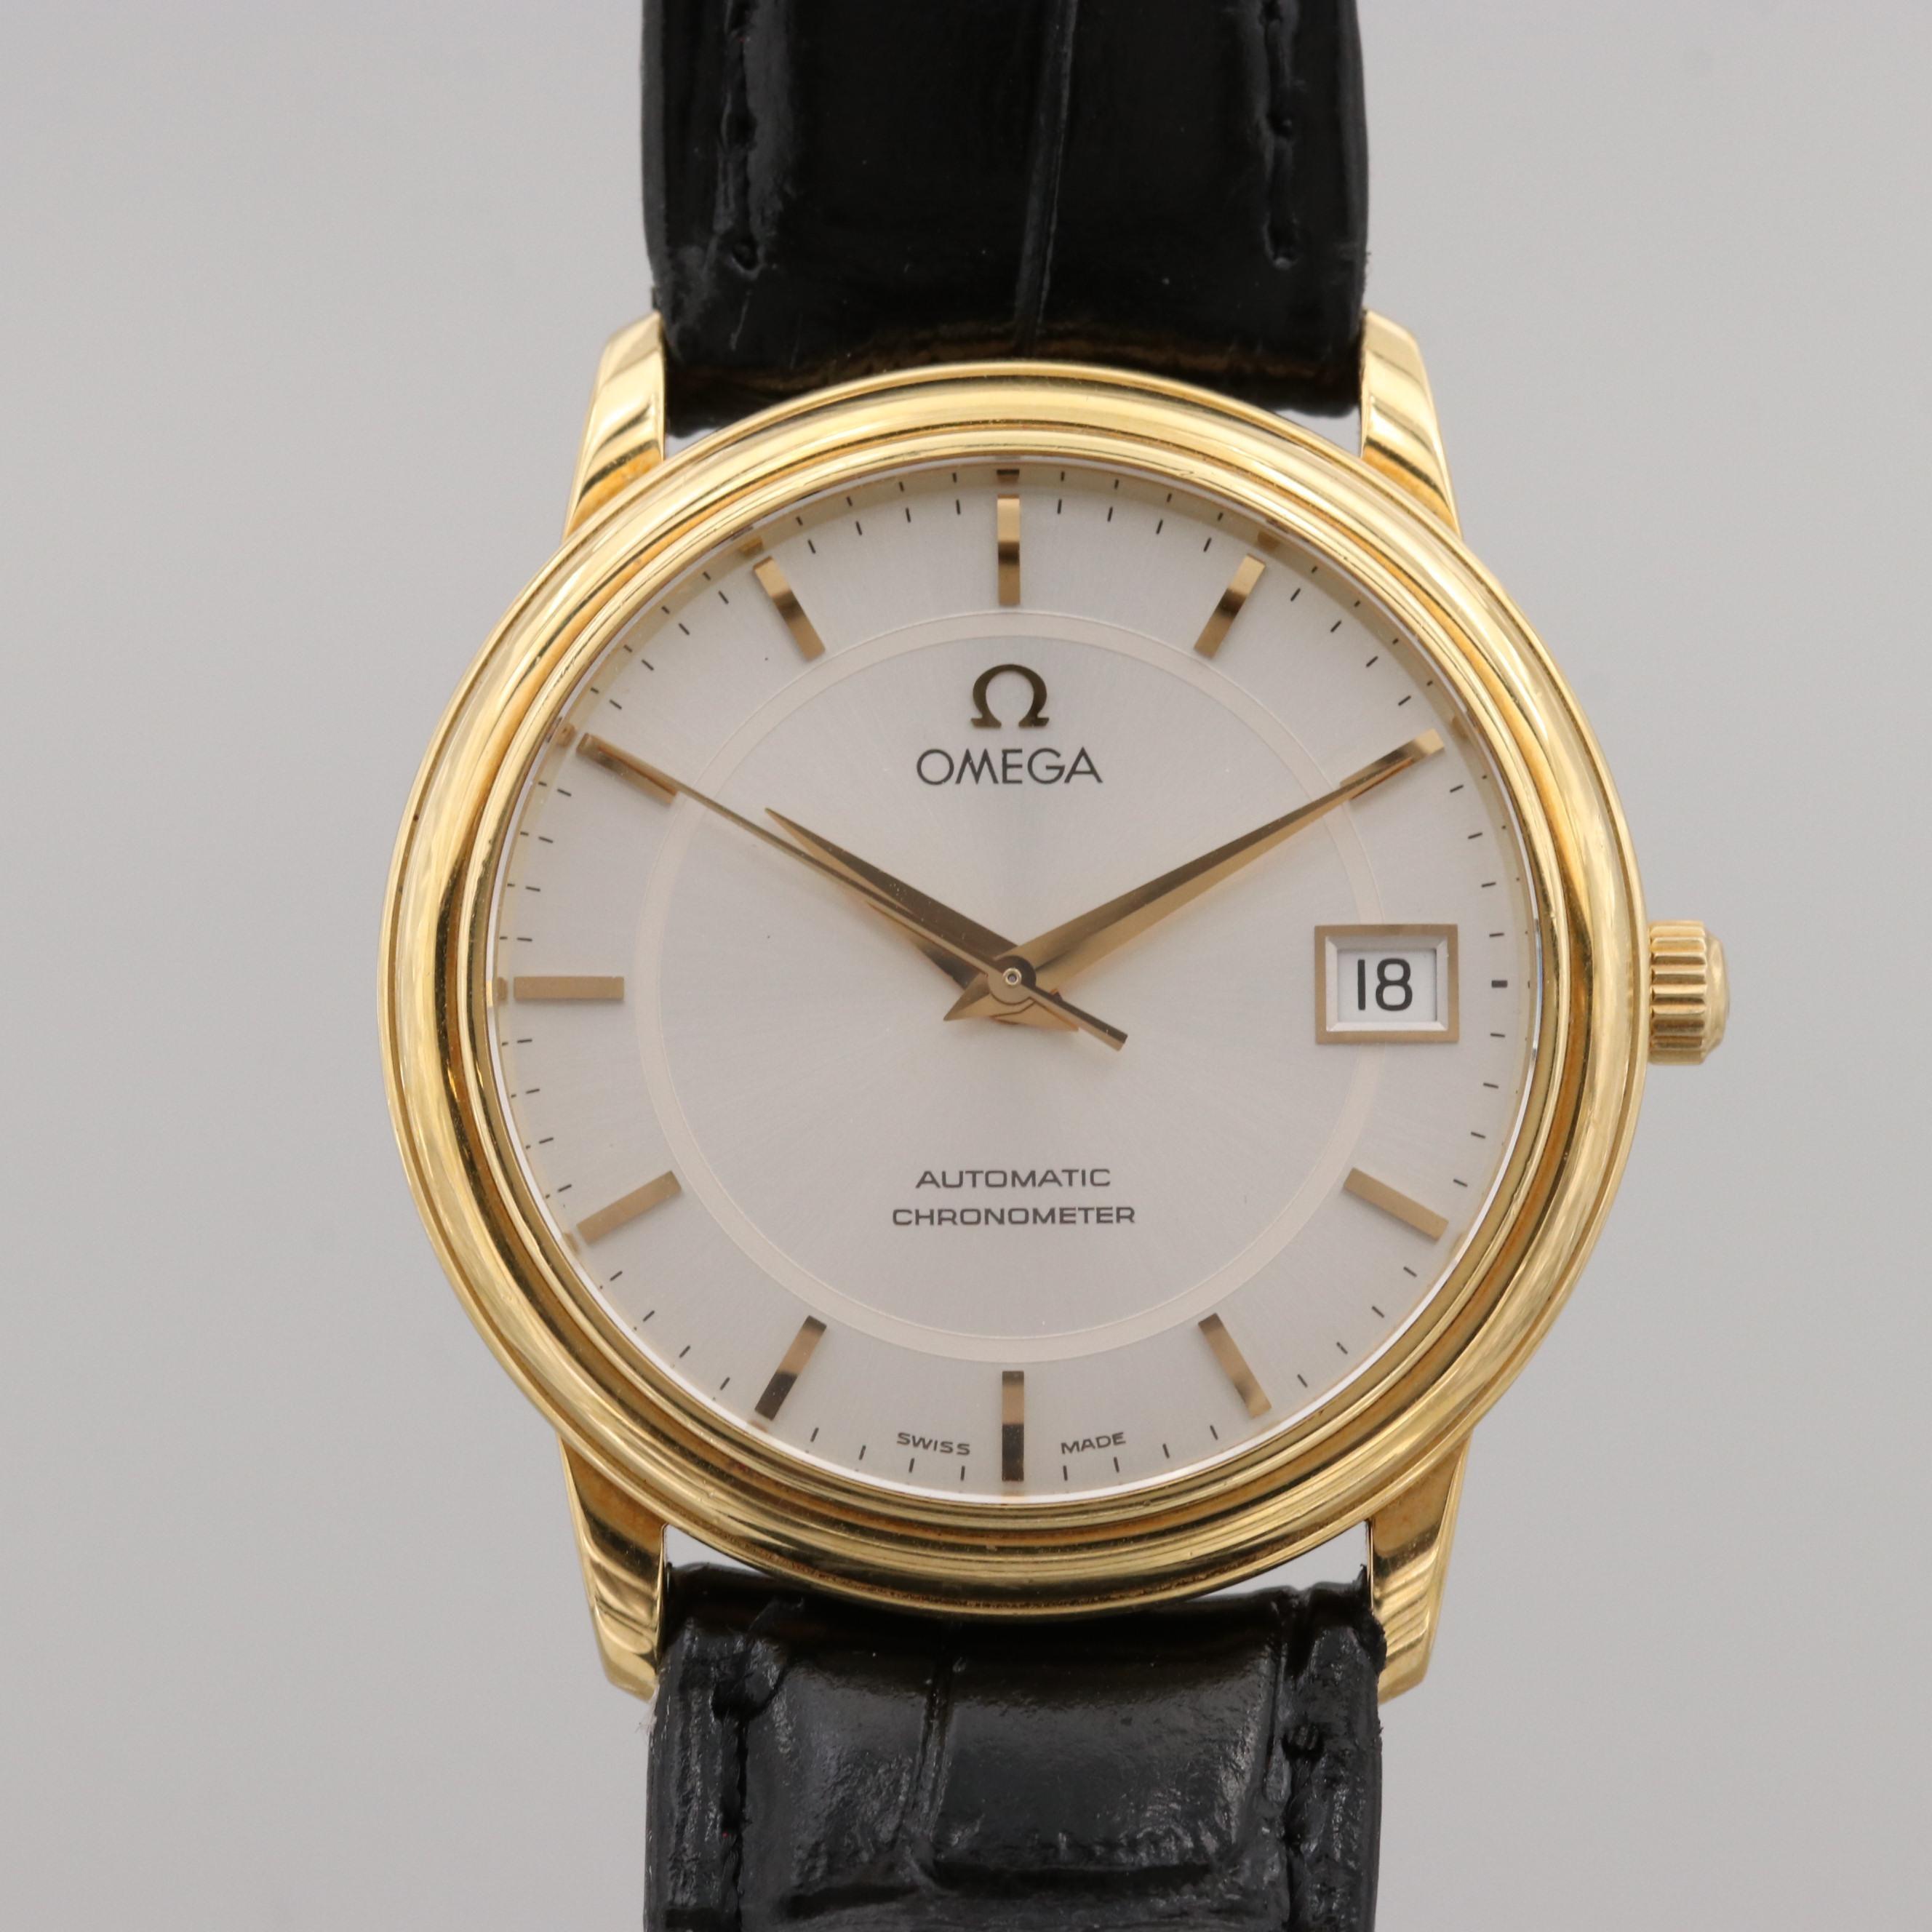 Omega De Ville Prestige 18K Yellow Gold Chronometer Wristwatch With Date Window